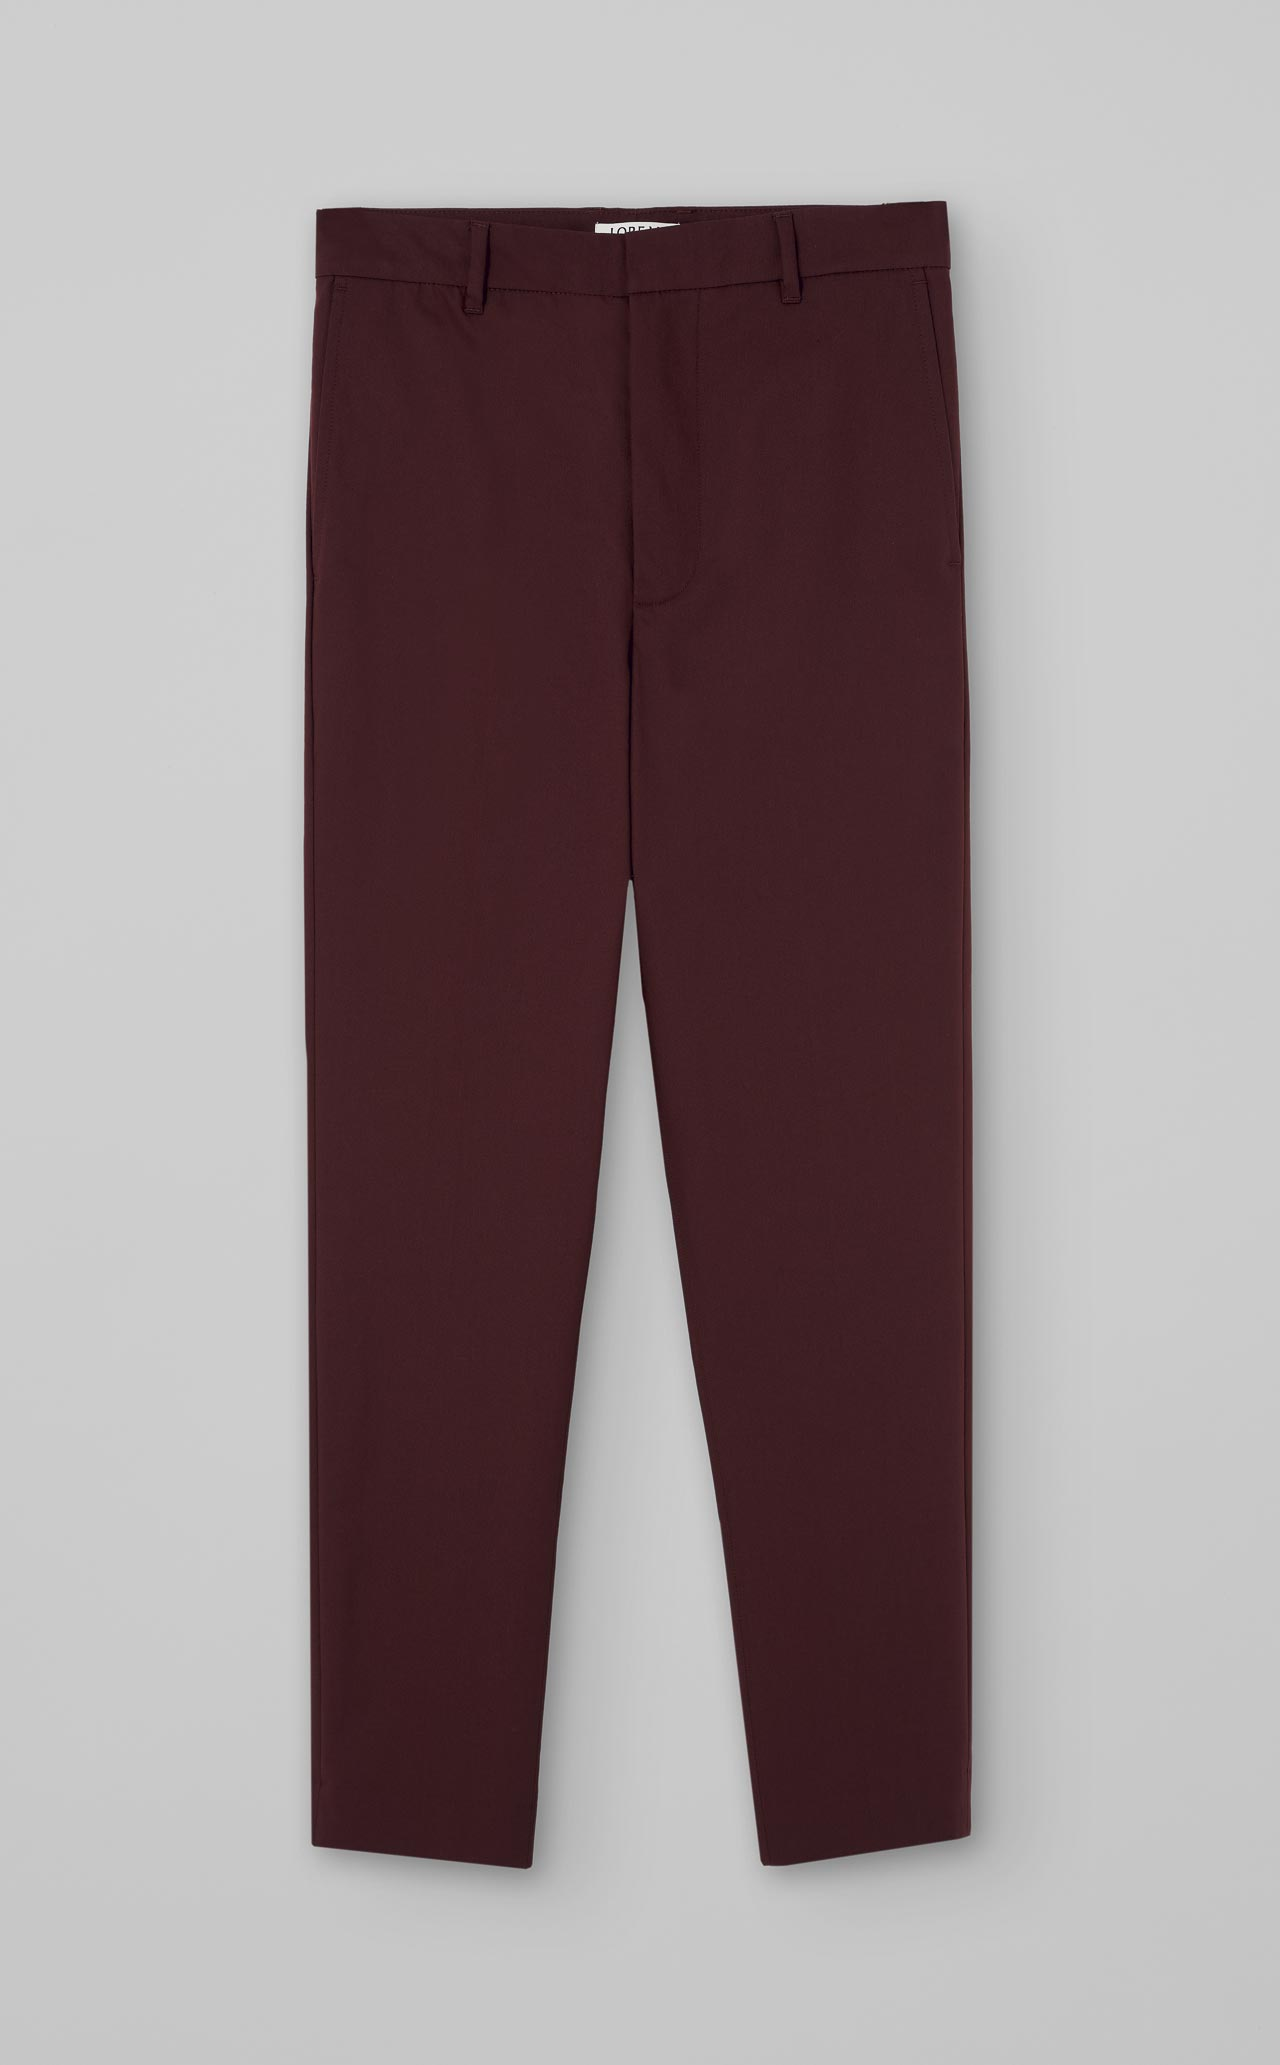 Pantalon Philiprn